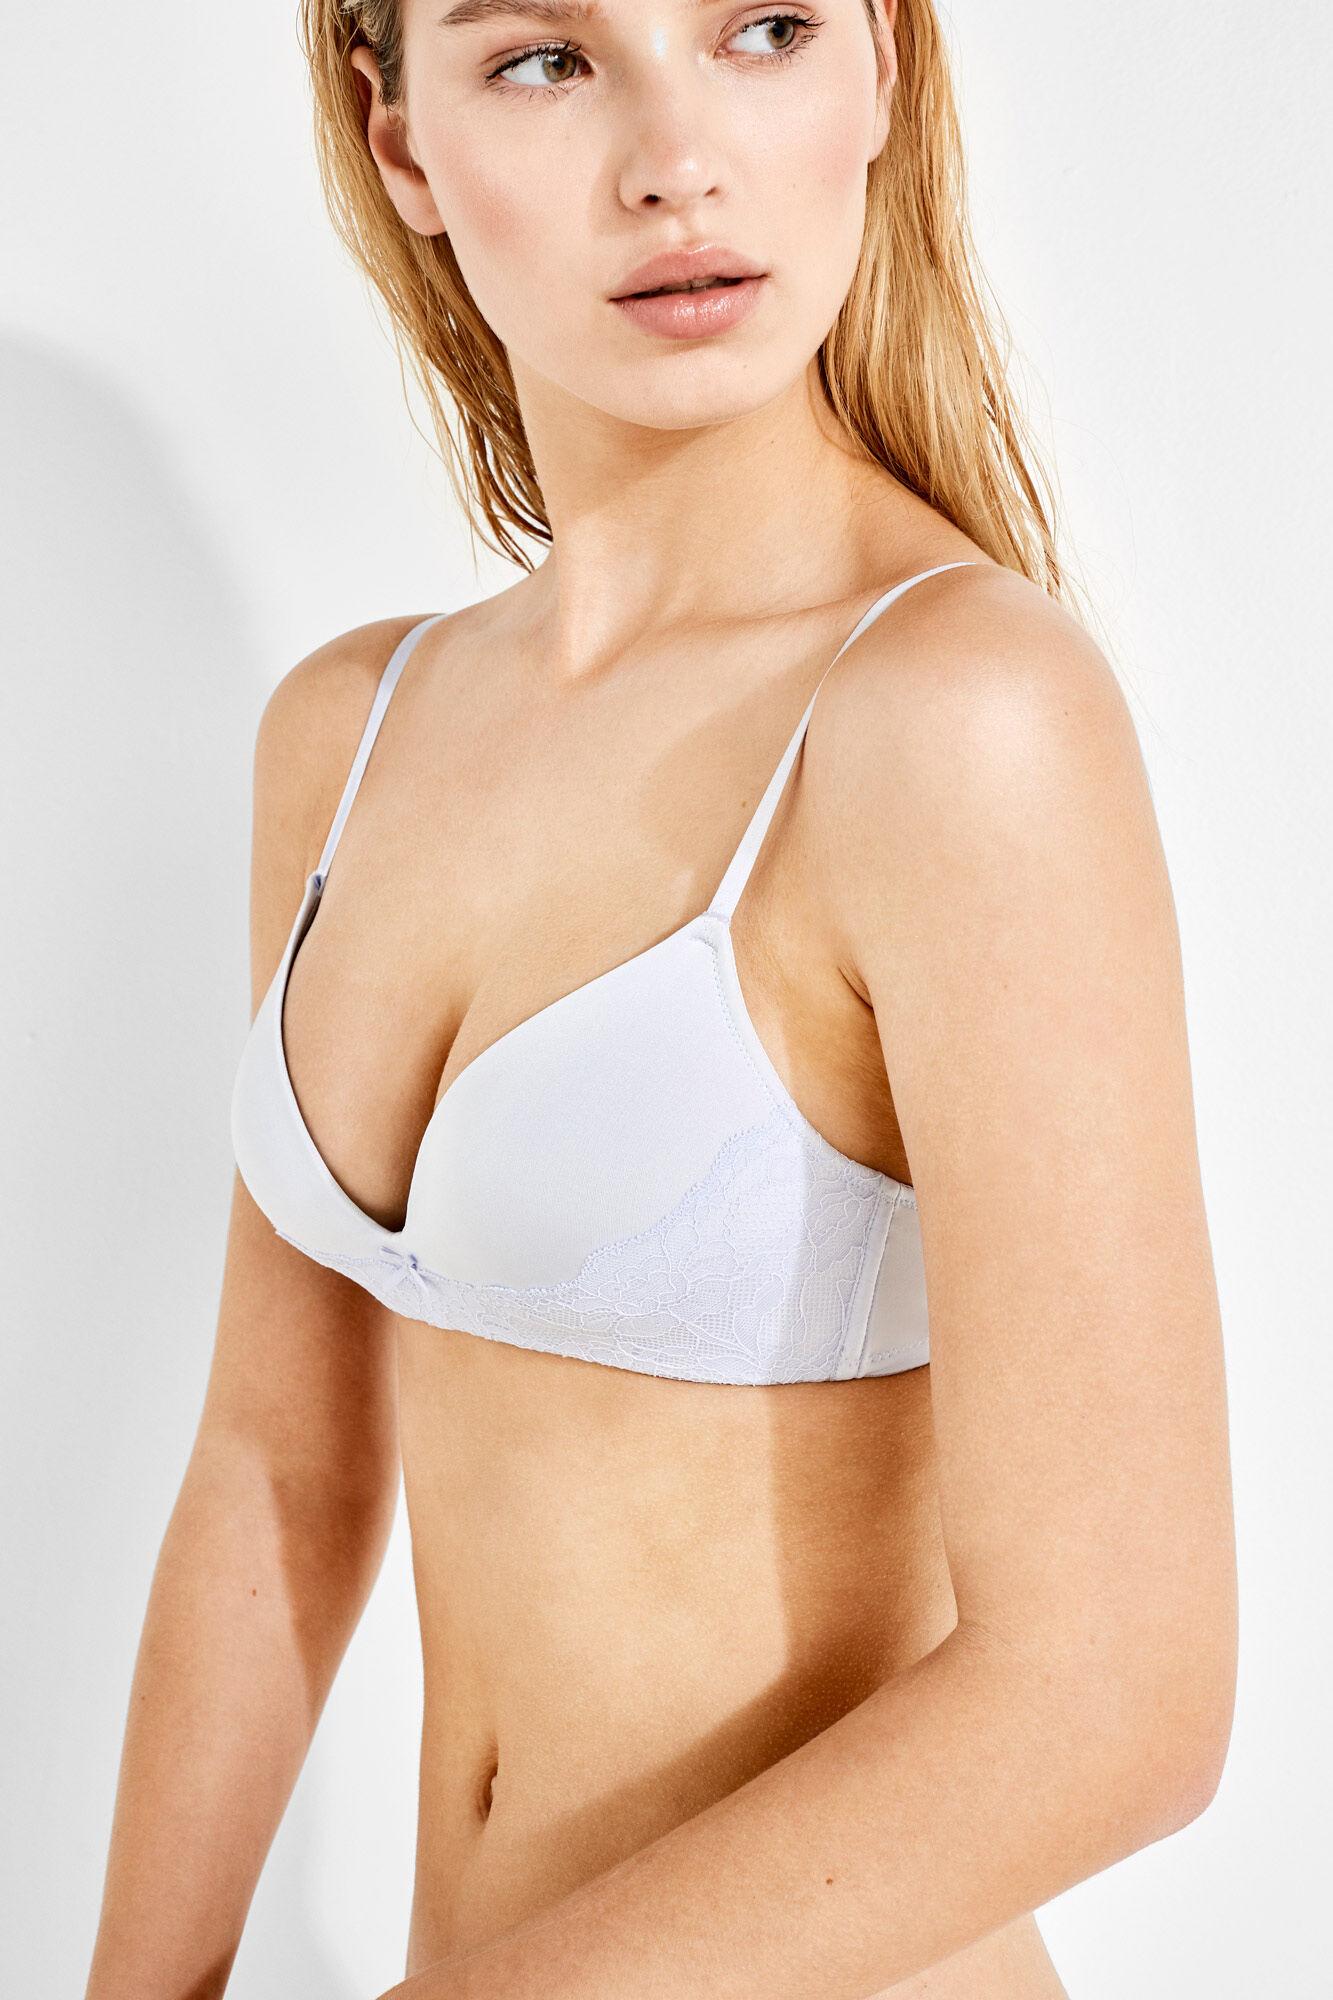 92b1f6184d20 Triangle bra with lace detail | Triangle | Women'secret